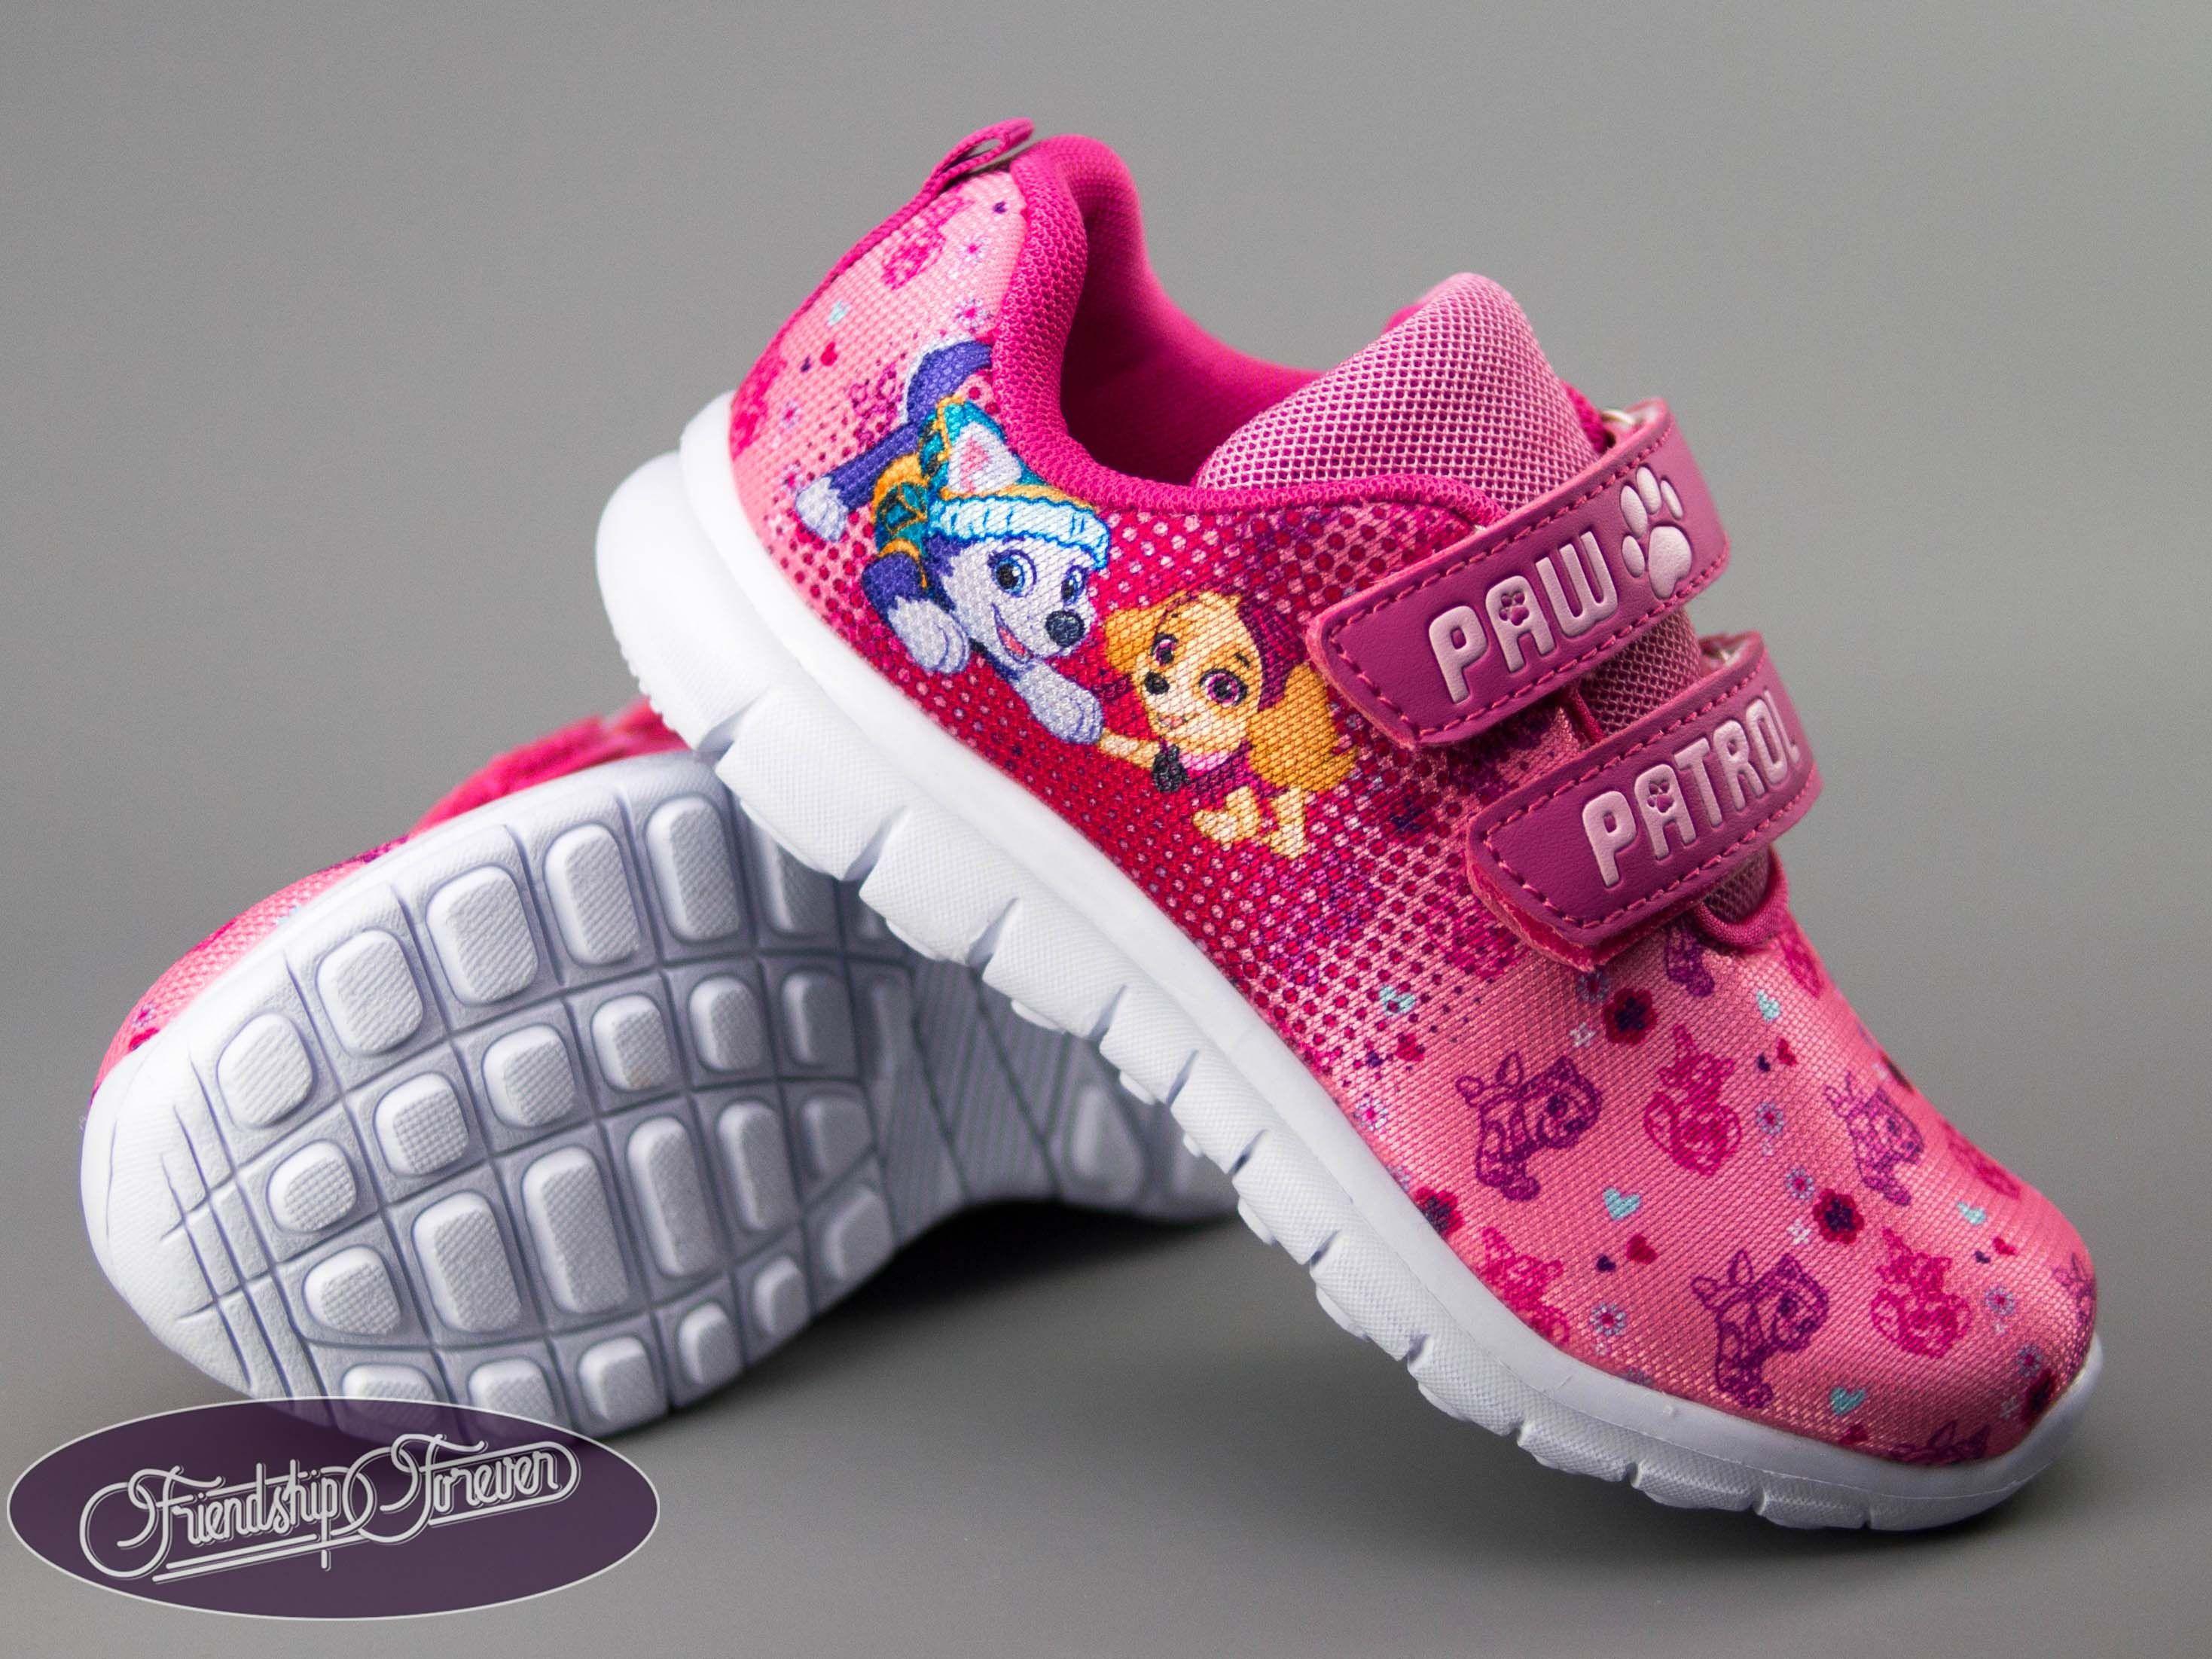 Gorjuss Little Love Kids low-top Canvas Shoes Santoro London Trainers Sneakers